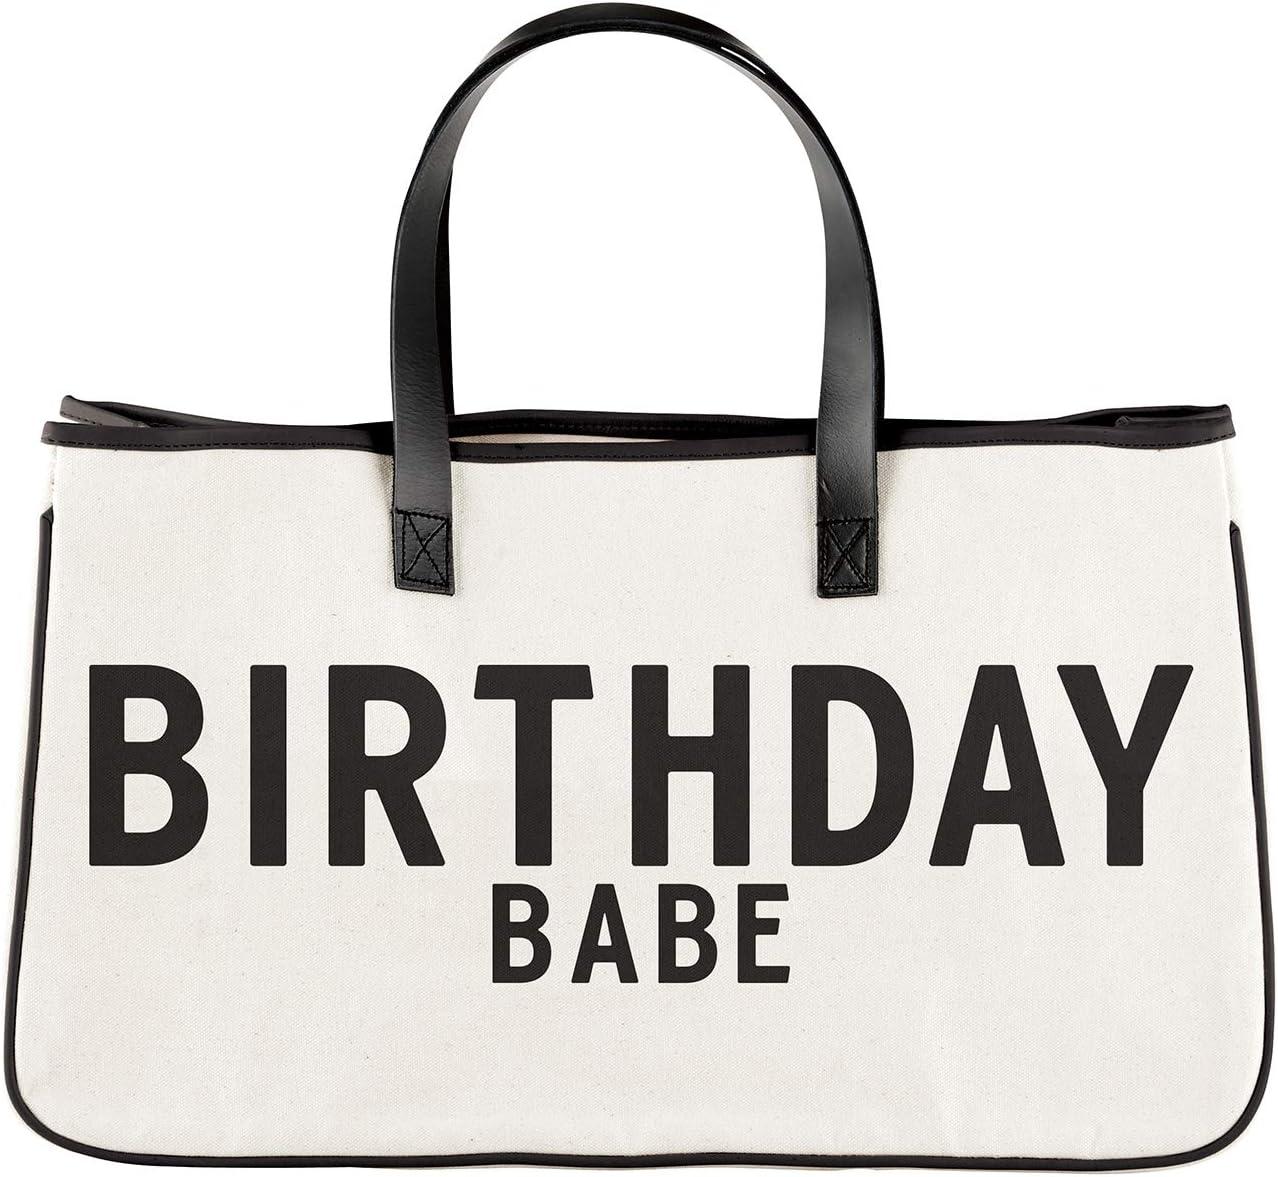 Santa Barbara Design Studio Hold Everything Canvas Tote, Large, Birthday Babe